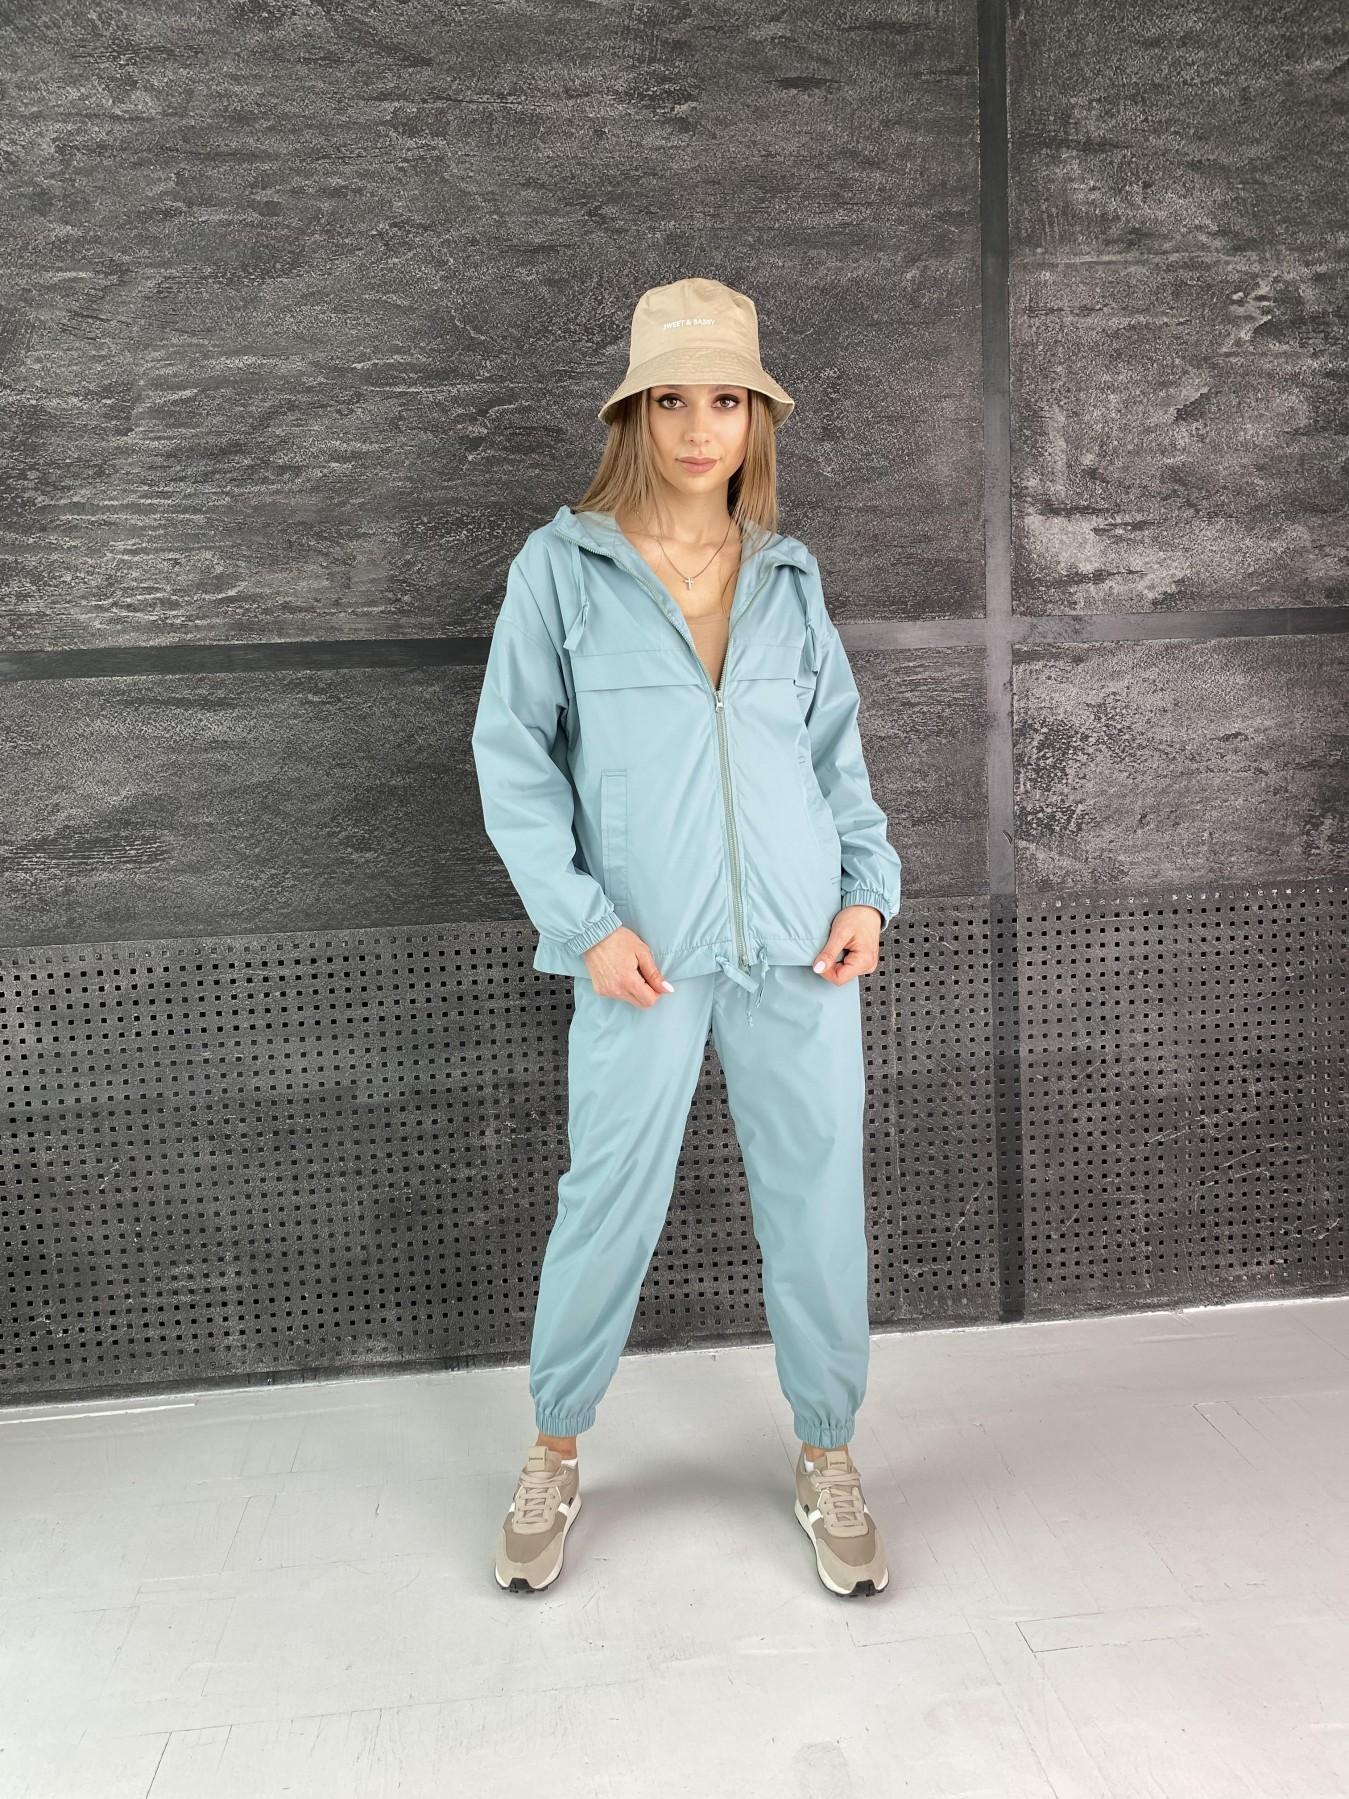 Фит костюм  из плащевой ткани Astra 11052 АРТ. 47536 Цвет: Олива - фото 6, интернет магазин tm-modus.ru